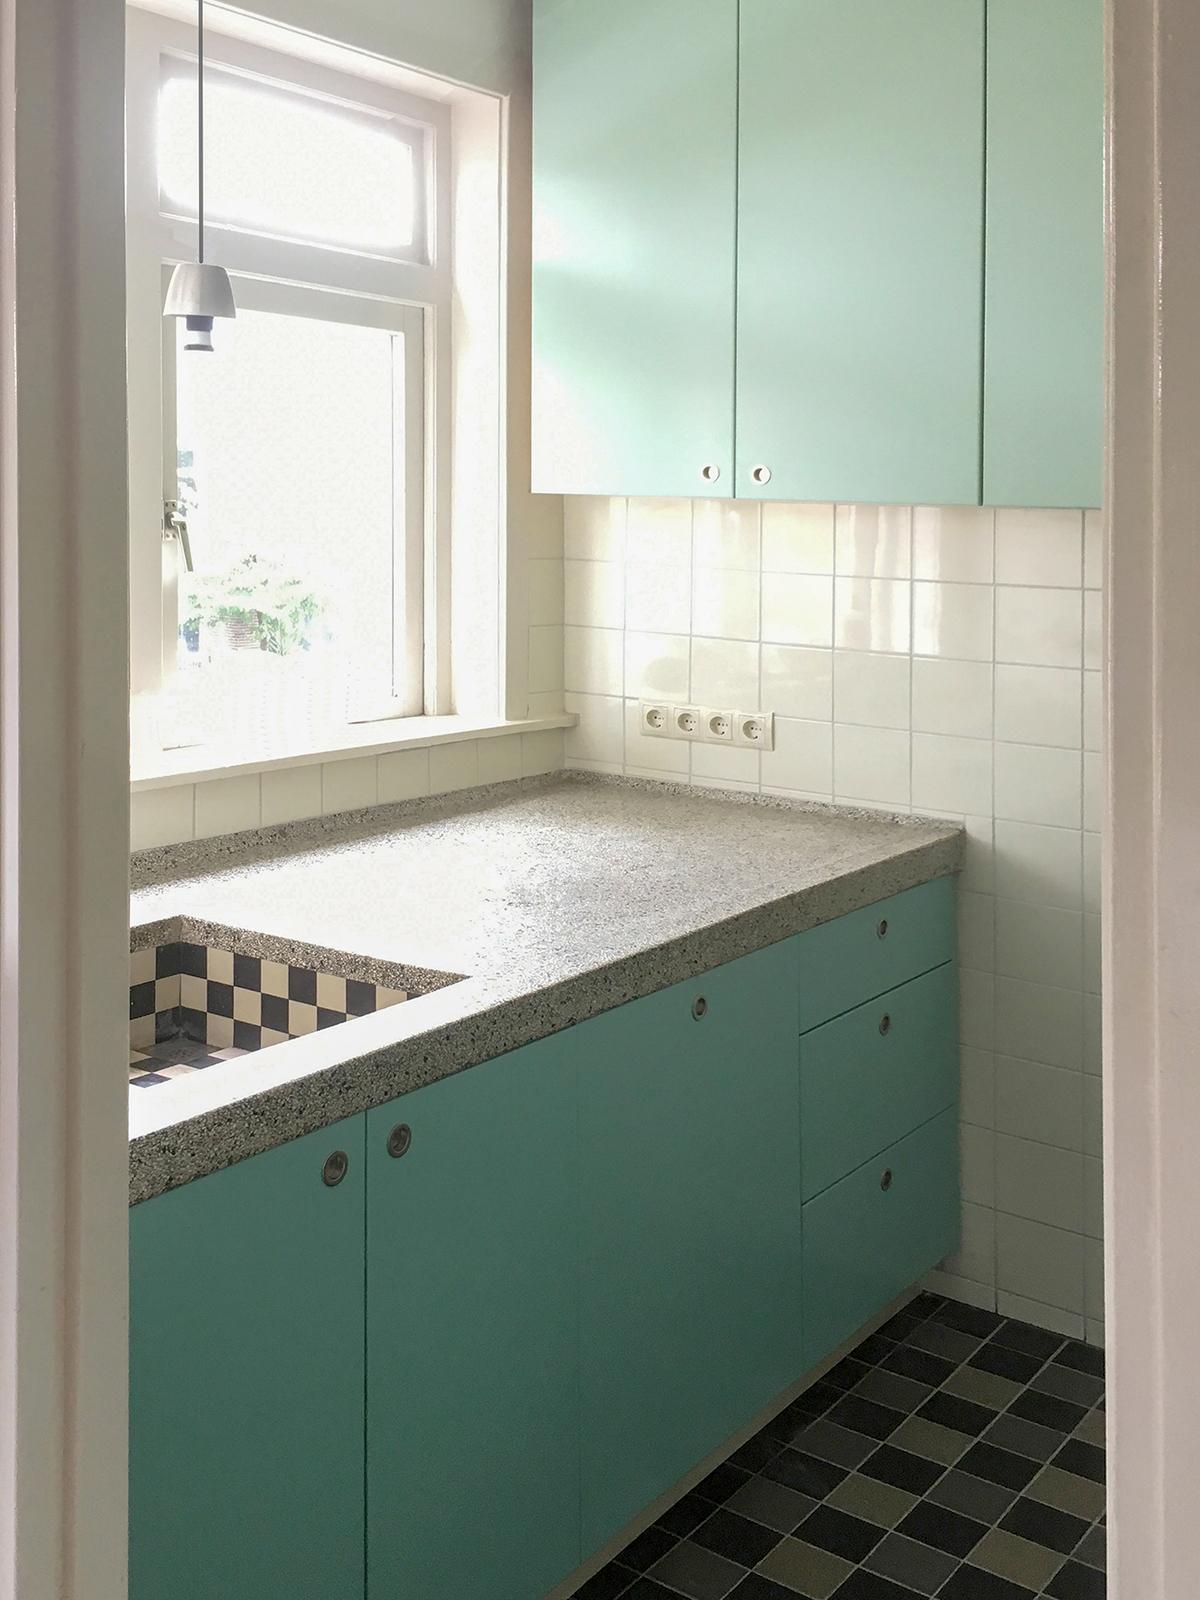 Keuken in kleine ruimte